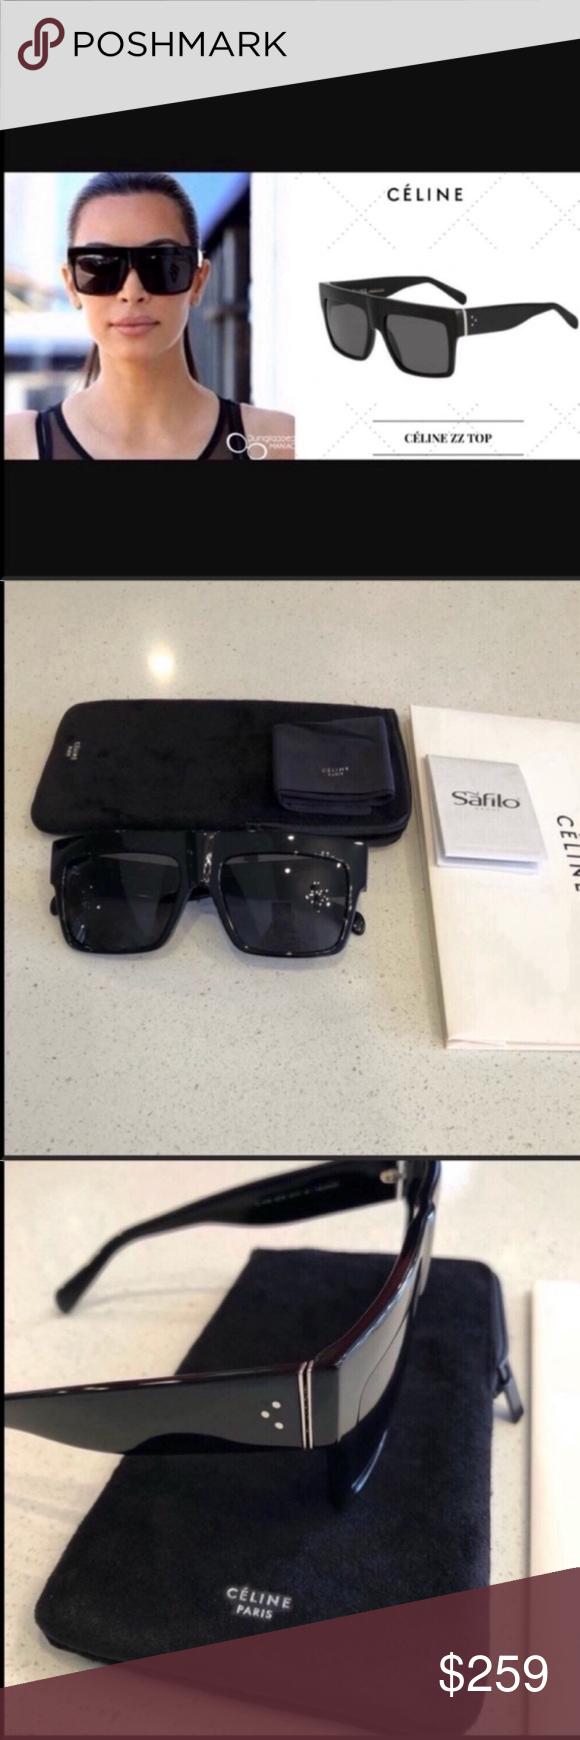 3592bf07a02 Celine sunglasses 🔥 Celine ZZ Top Black grey polarized sunglasses New  condition. 100% authentic guaranteed Includes Celine card